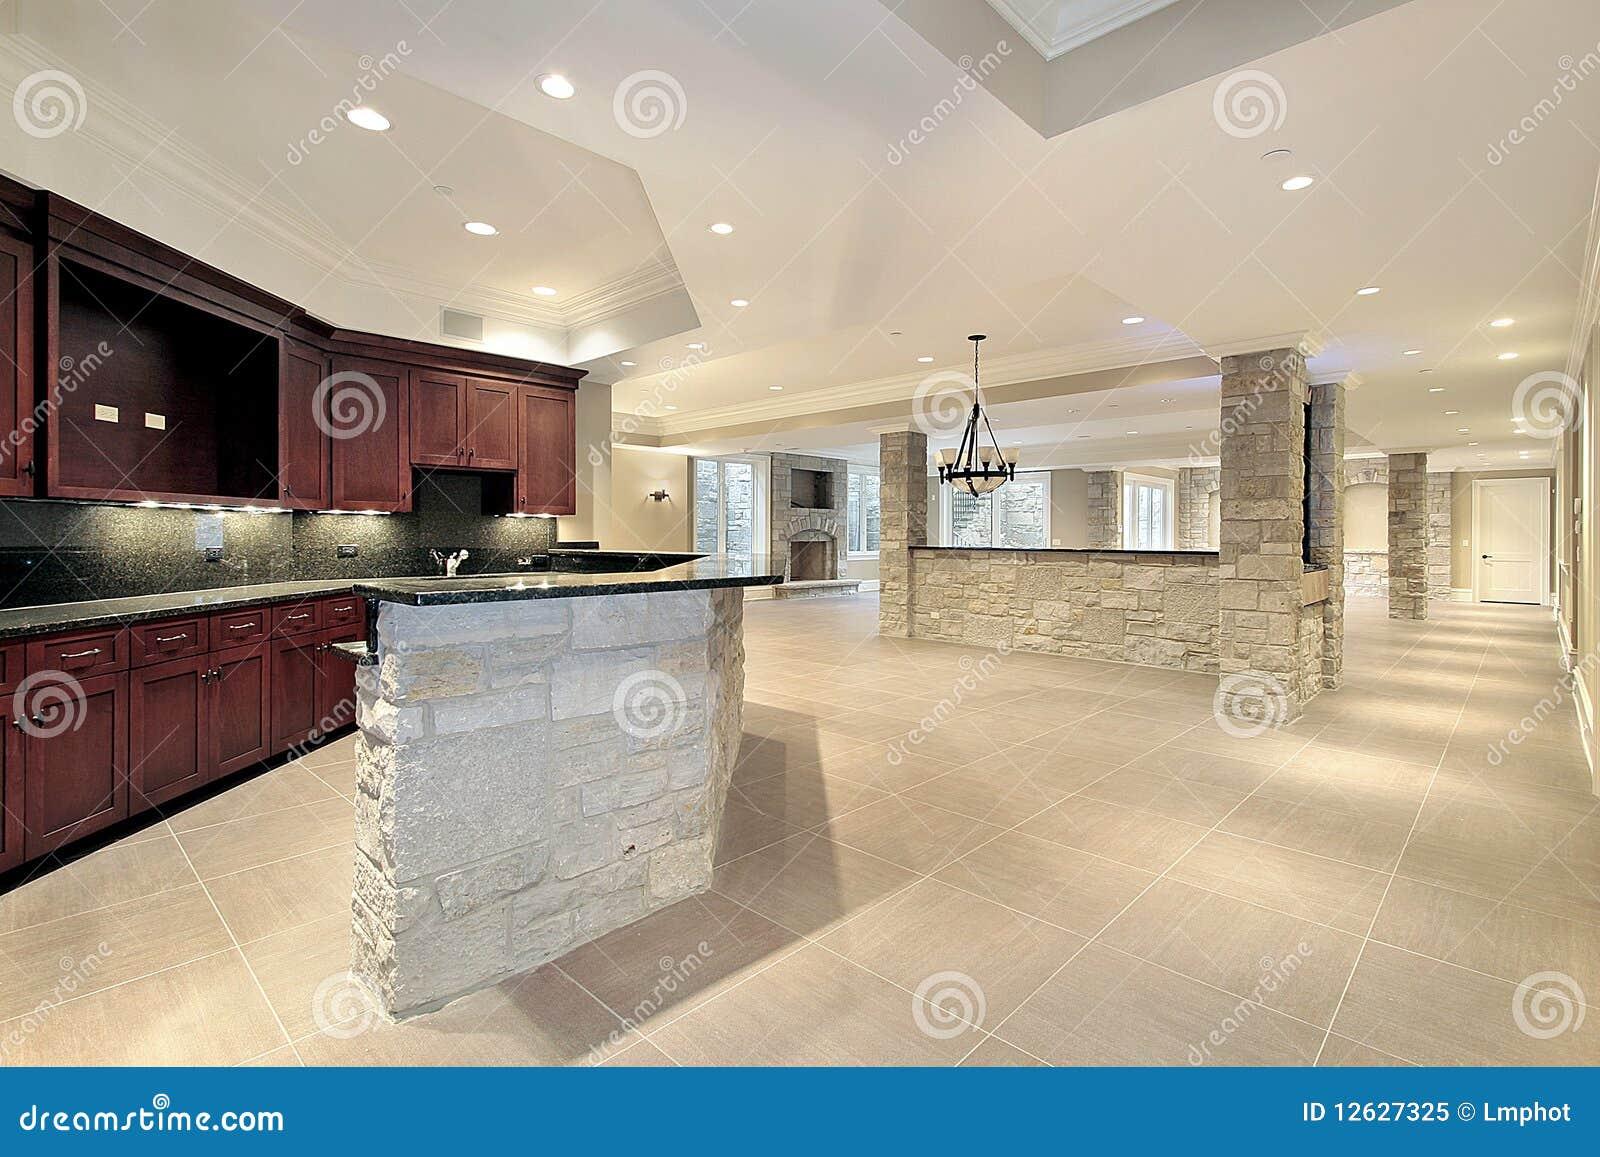 bar et cuisine en pierre en sous sol image stock image. Black Bedroom Furniture Sets. Home Design Ideas